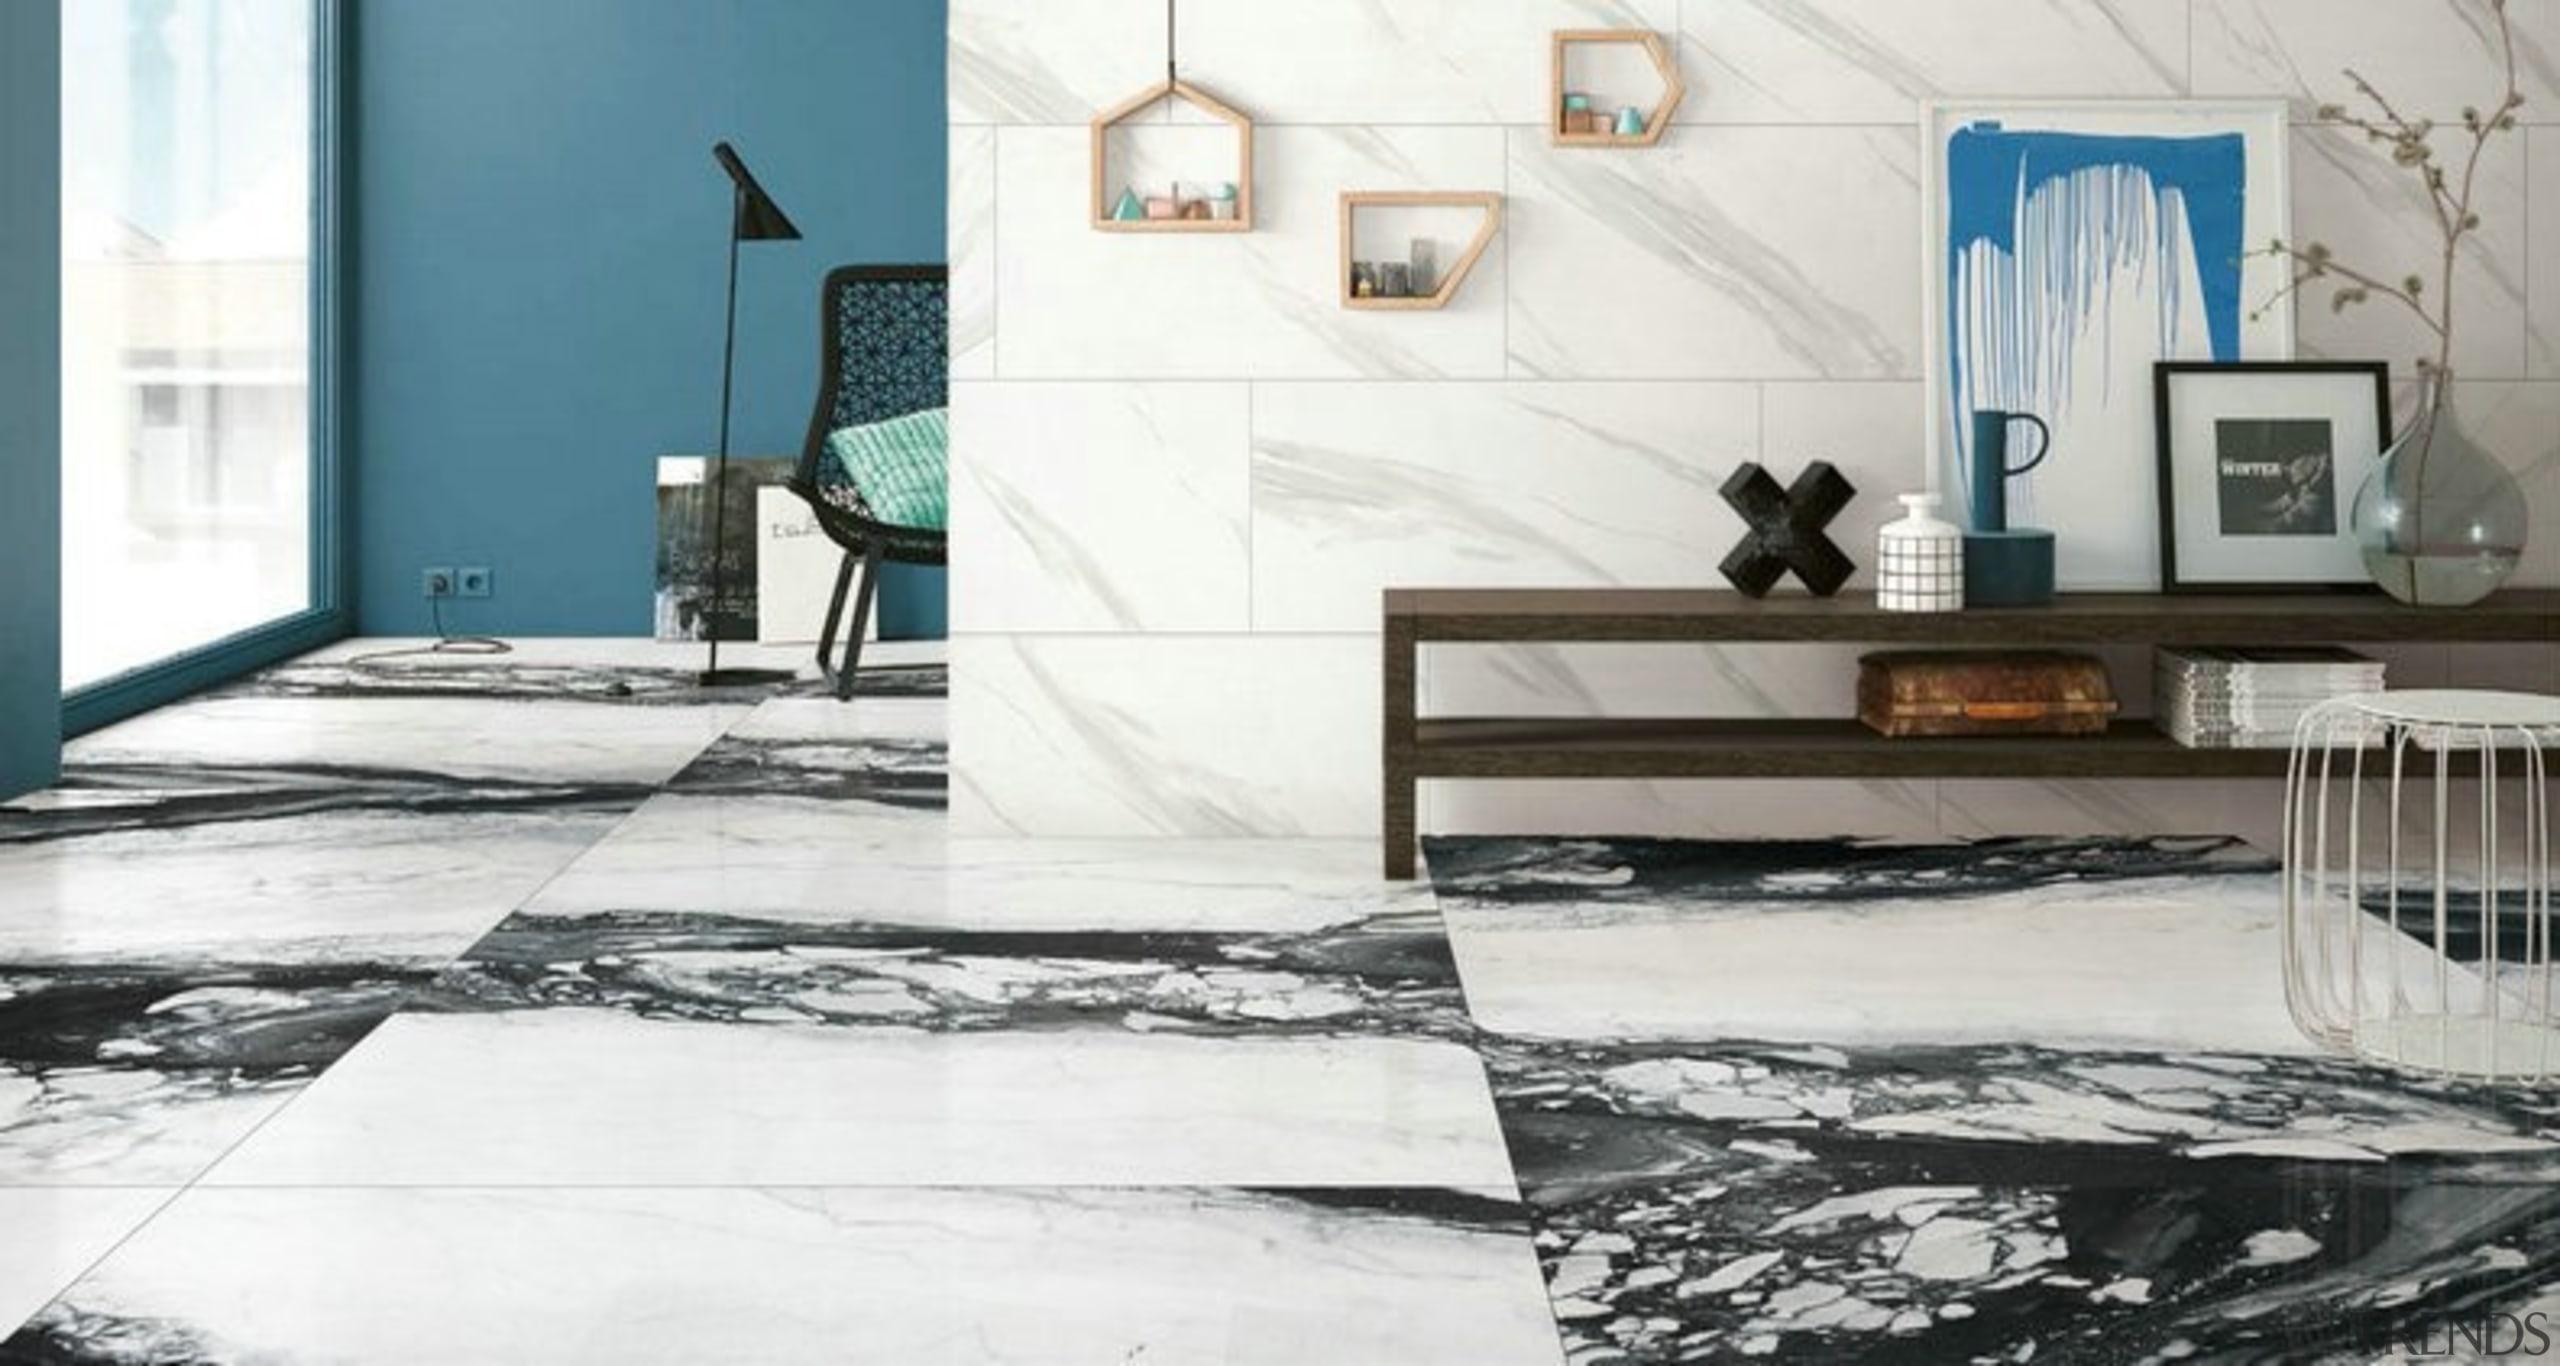 Extension Galaxy Satin 600x1200 - floor | flooring floor, flooring, furniture, interior design, table, tile, wall, white